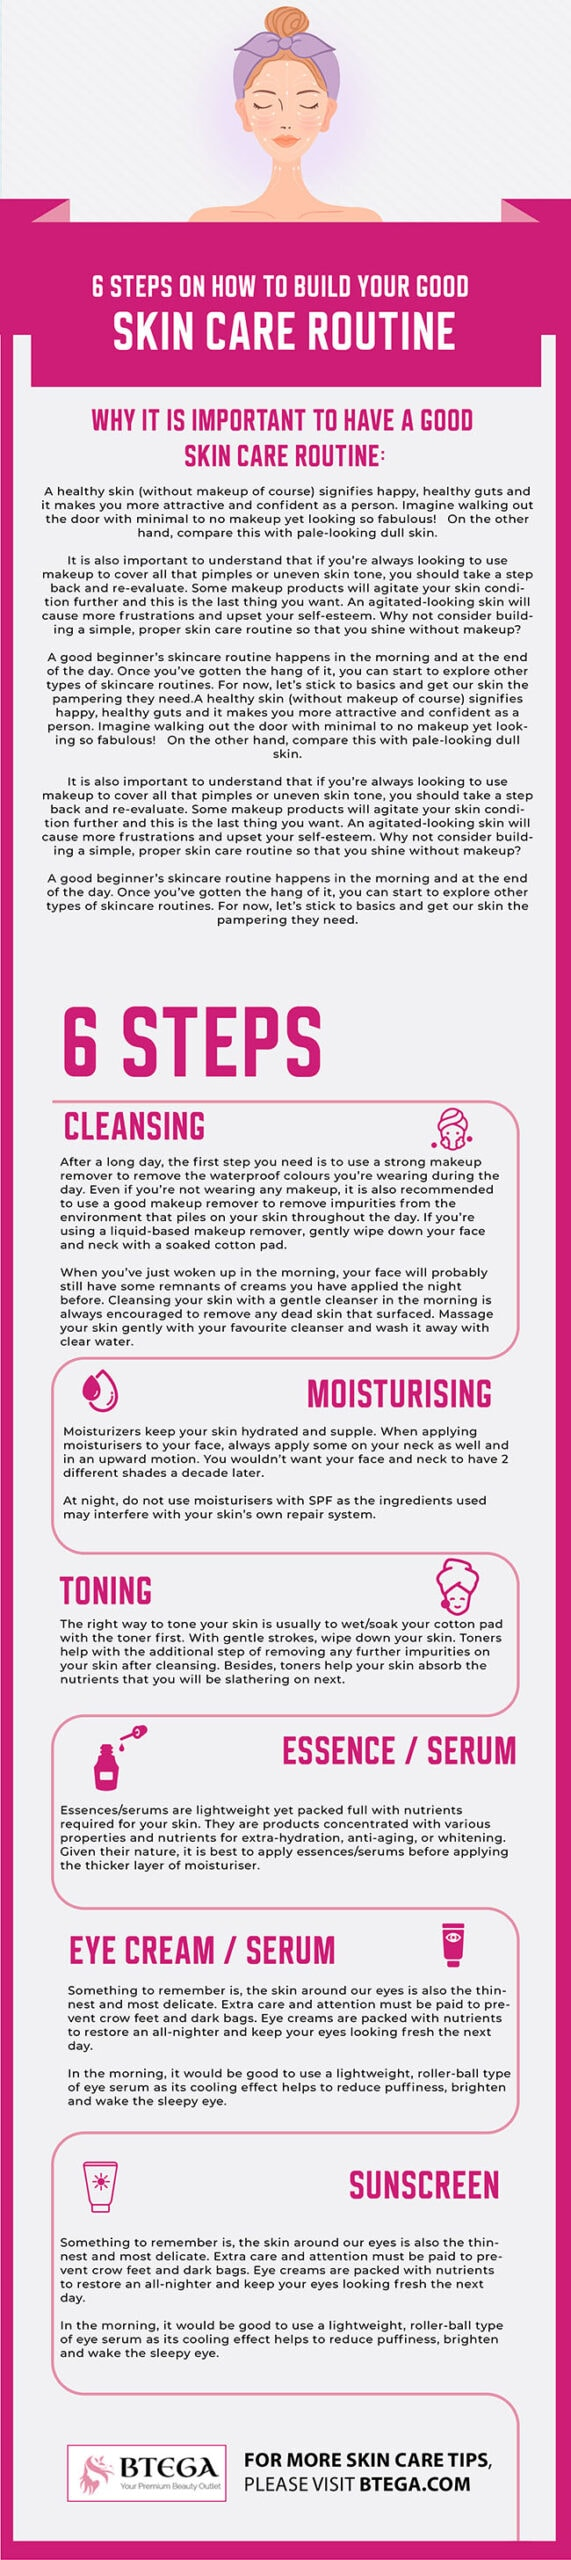 skin care routine - beginner's guide